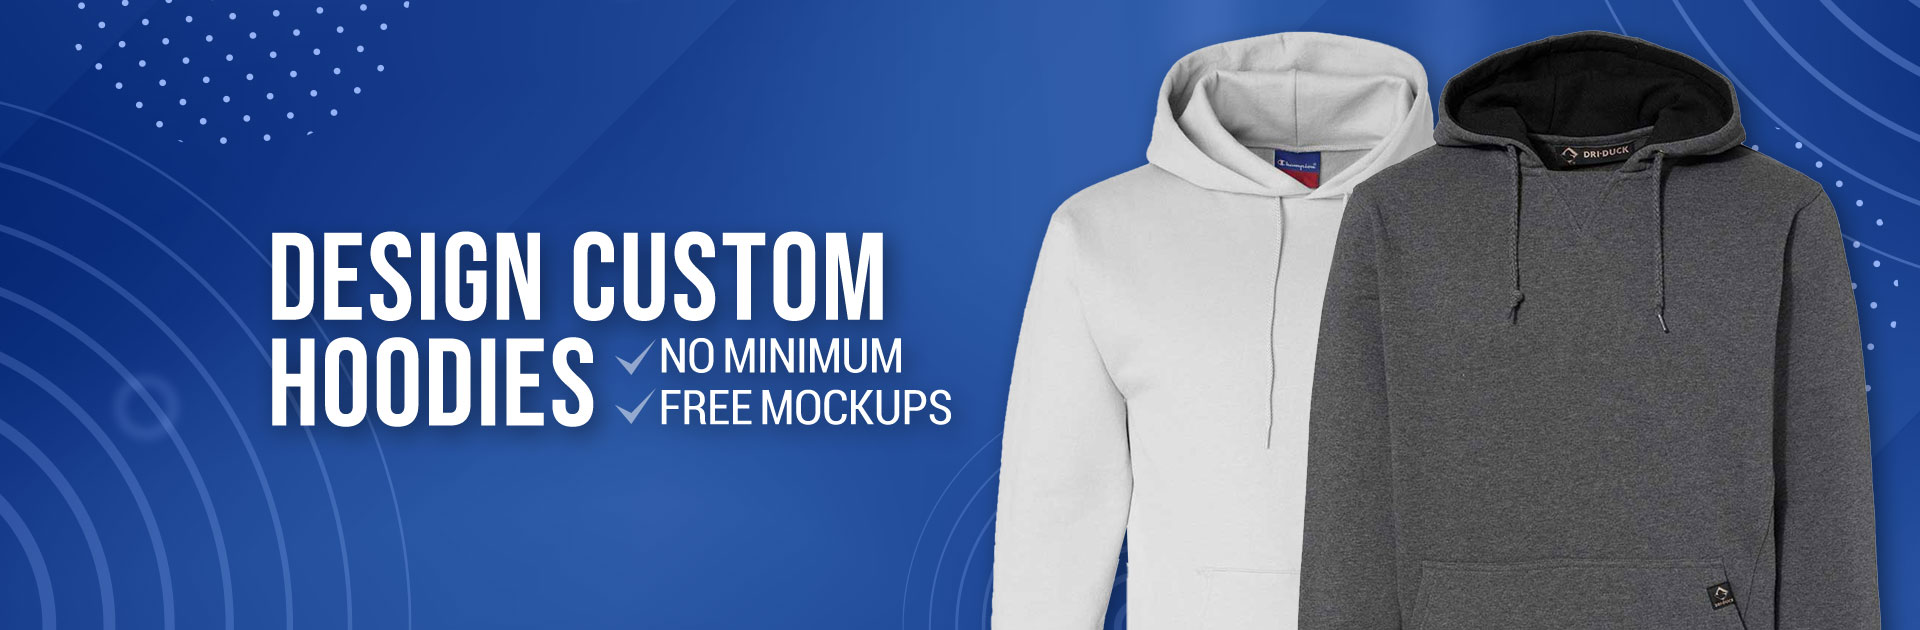 Design Custom Hoodies